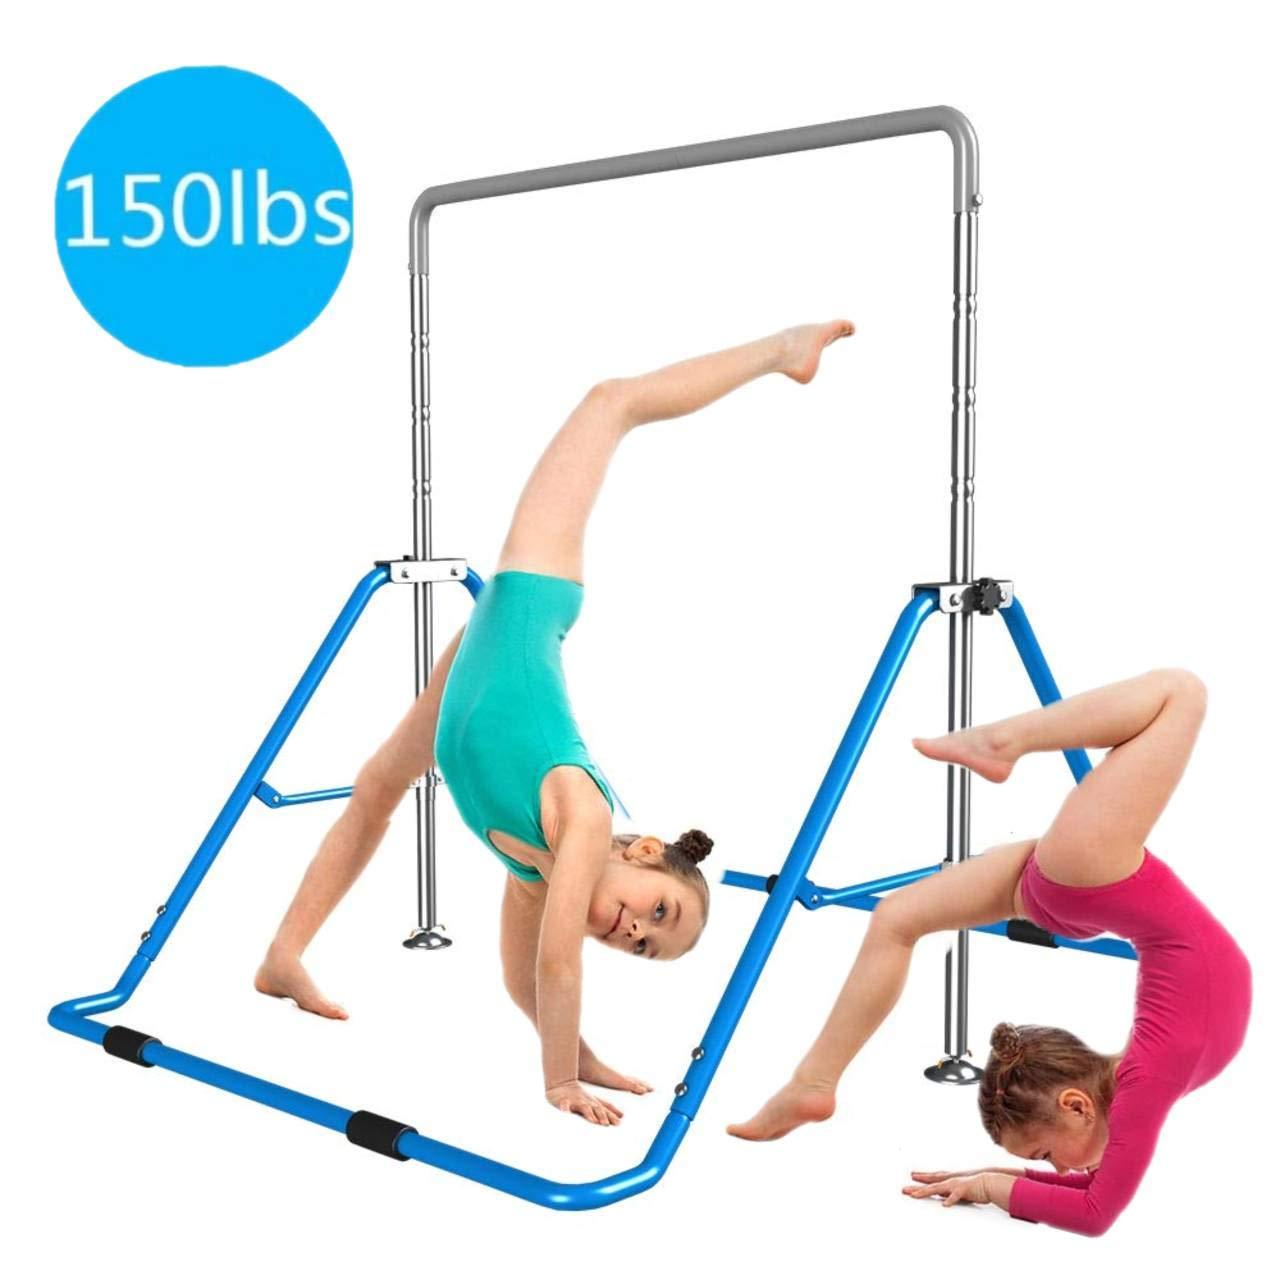 GEEKGEEK Gymnastics Gymnastic Equipment Horizontal